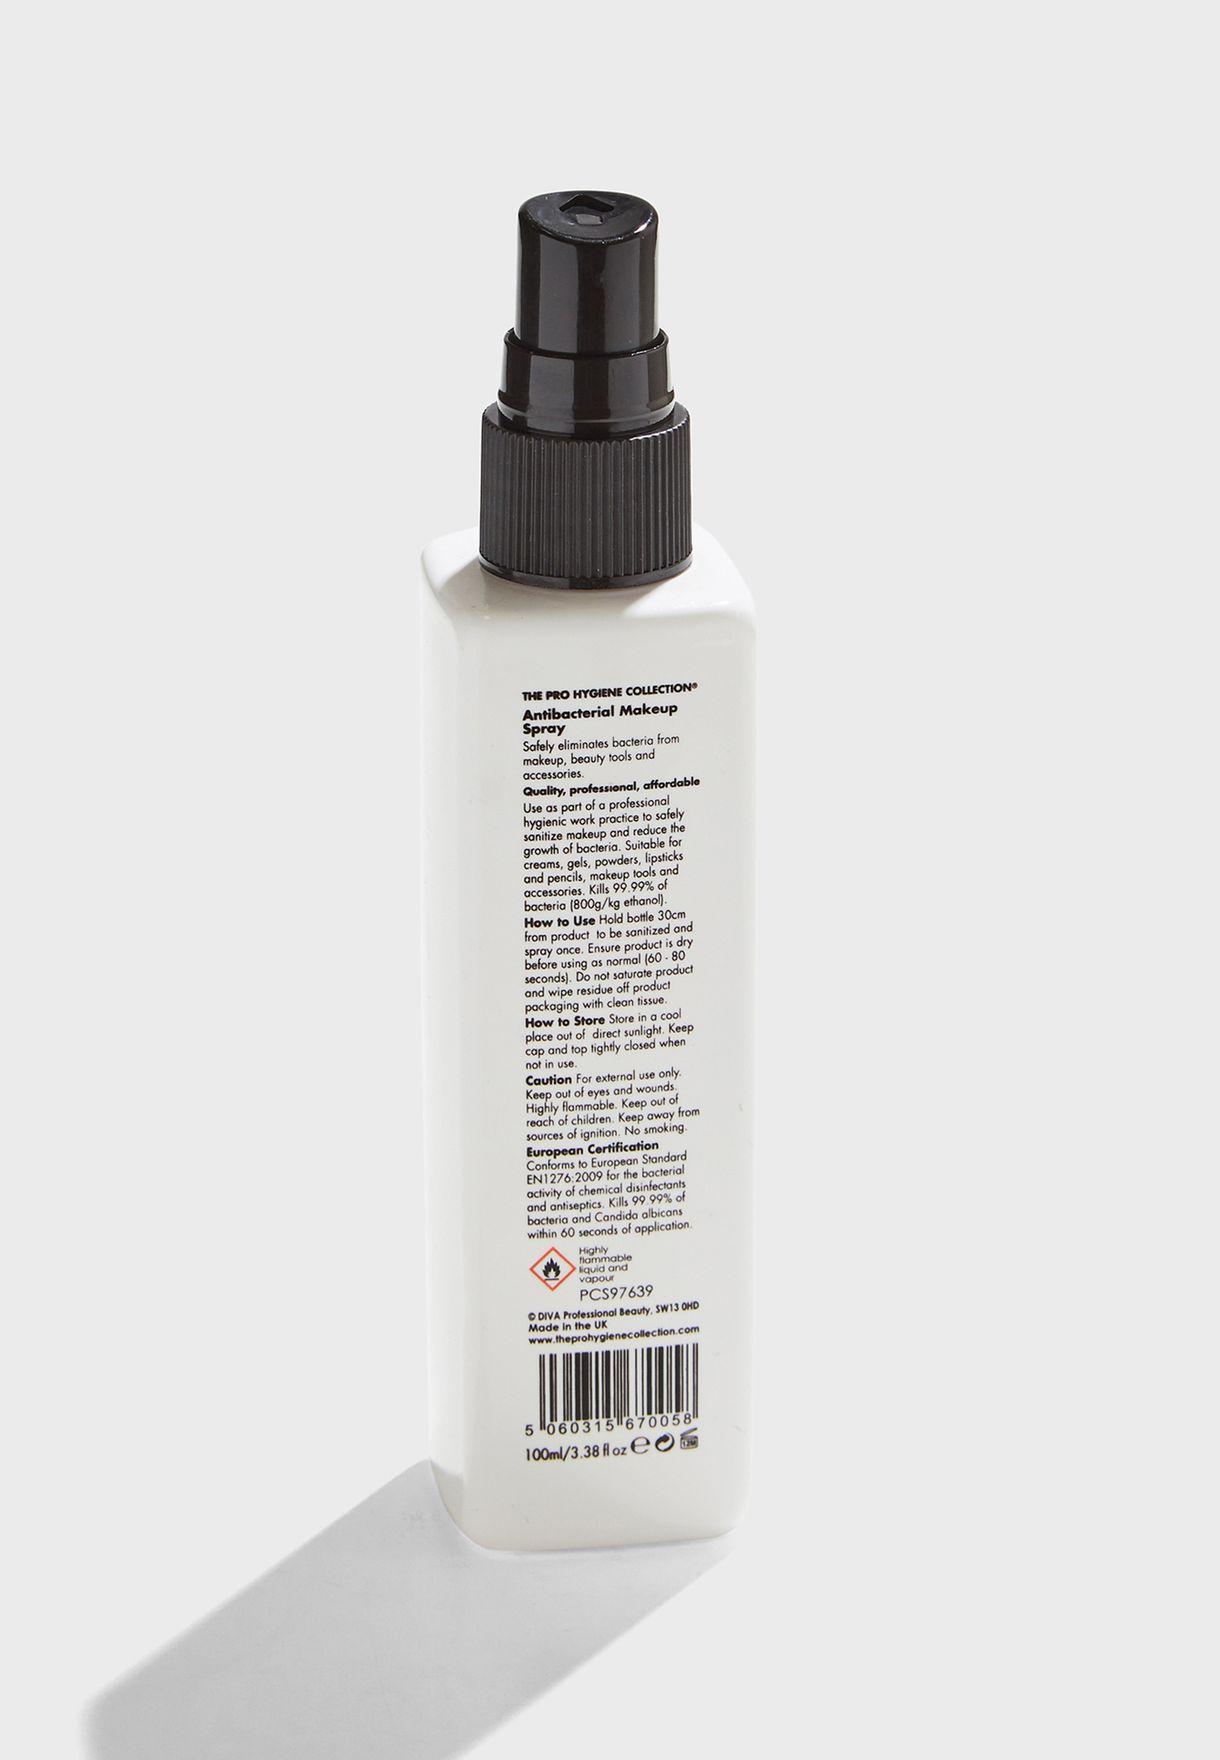 Antibacterial Makeup Spray - 100ml